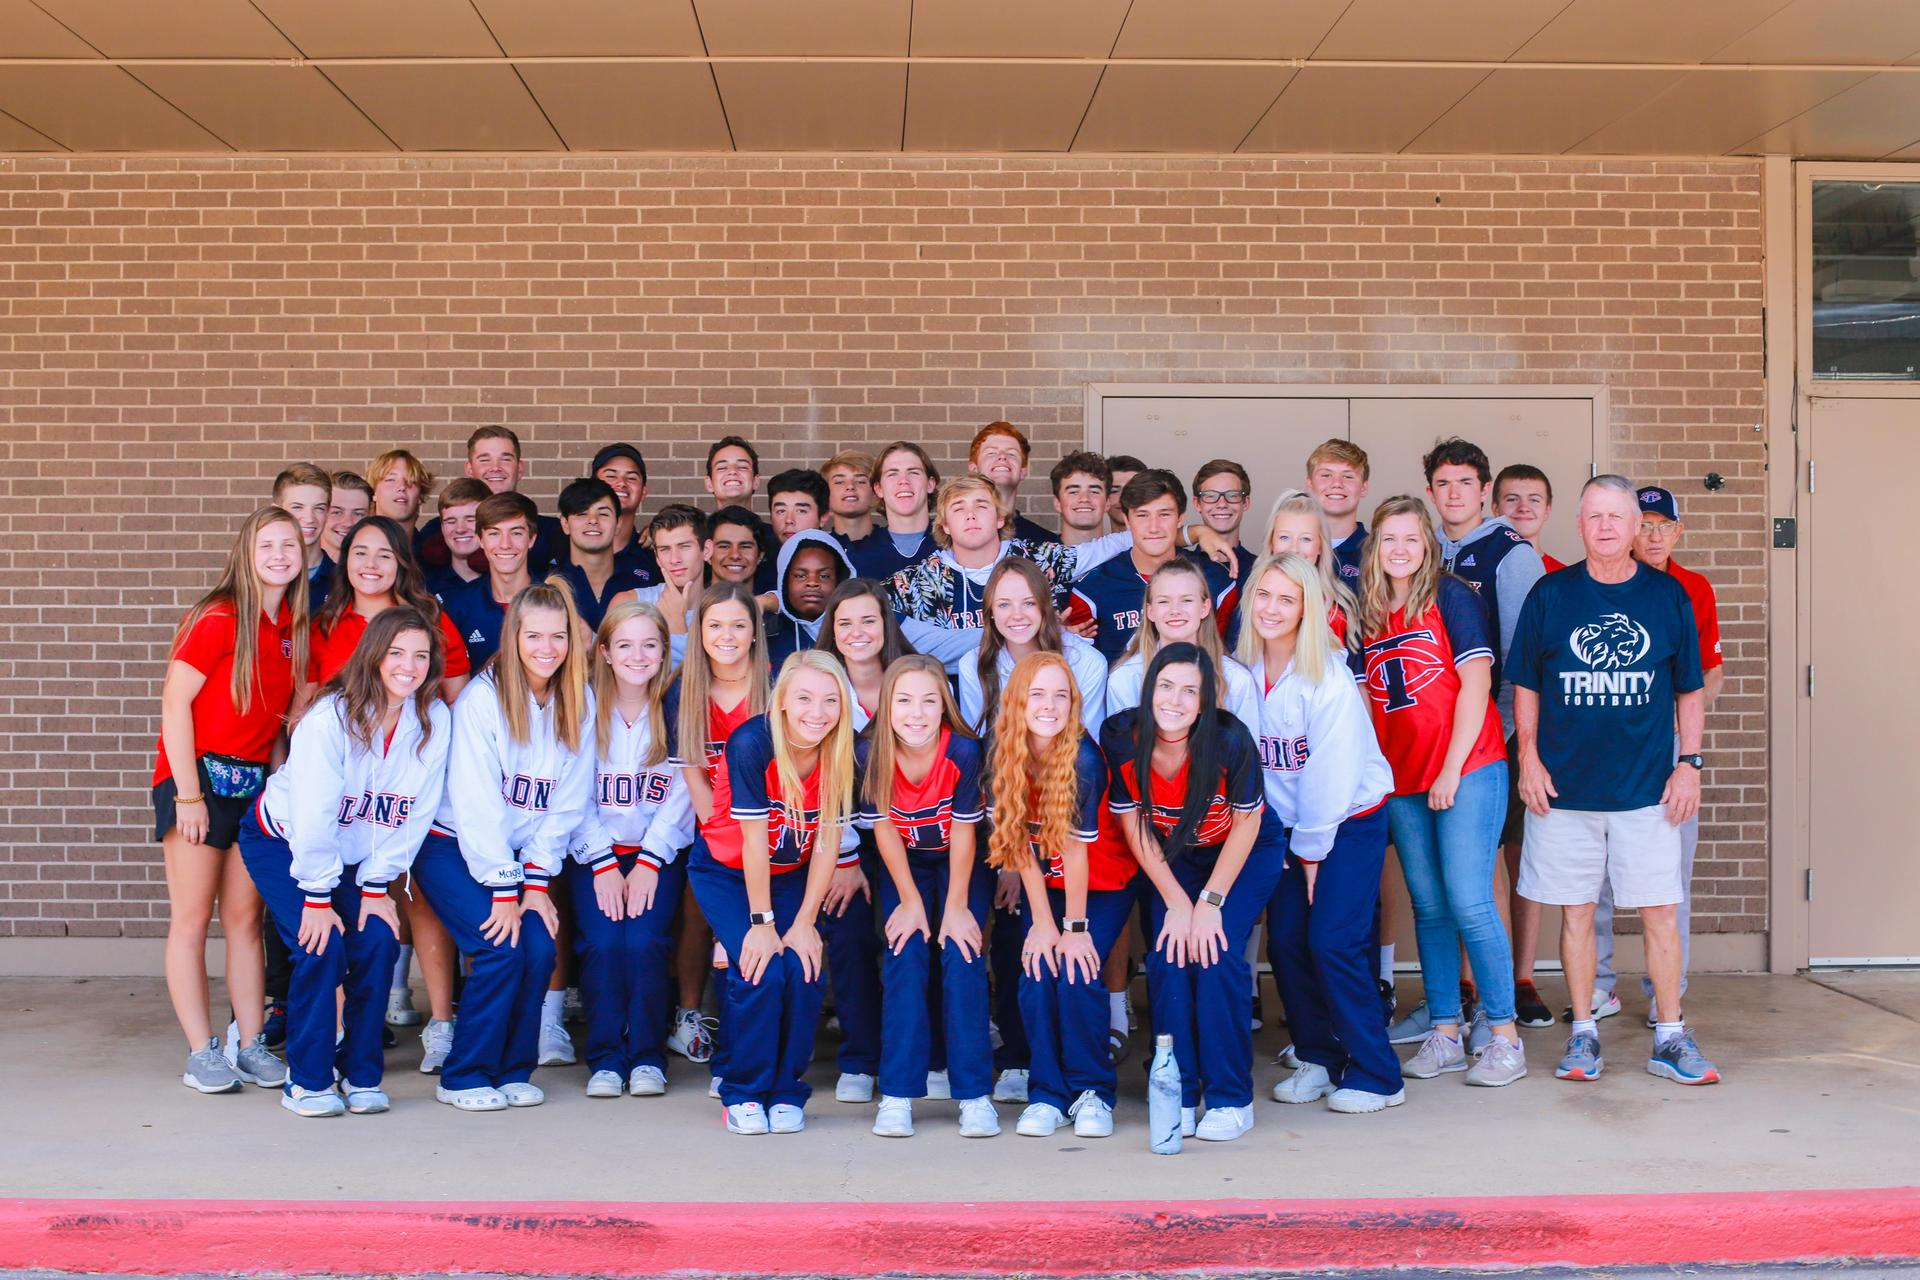 high school football team and cheerleaders